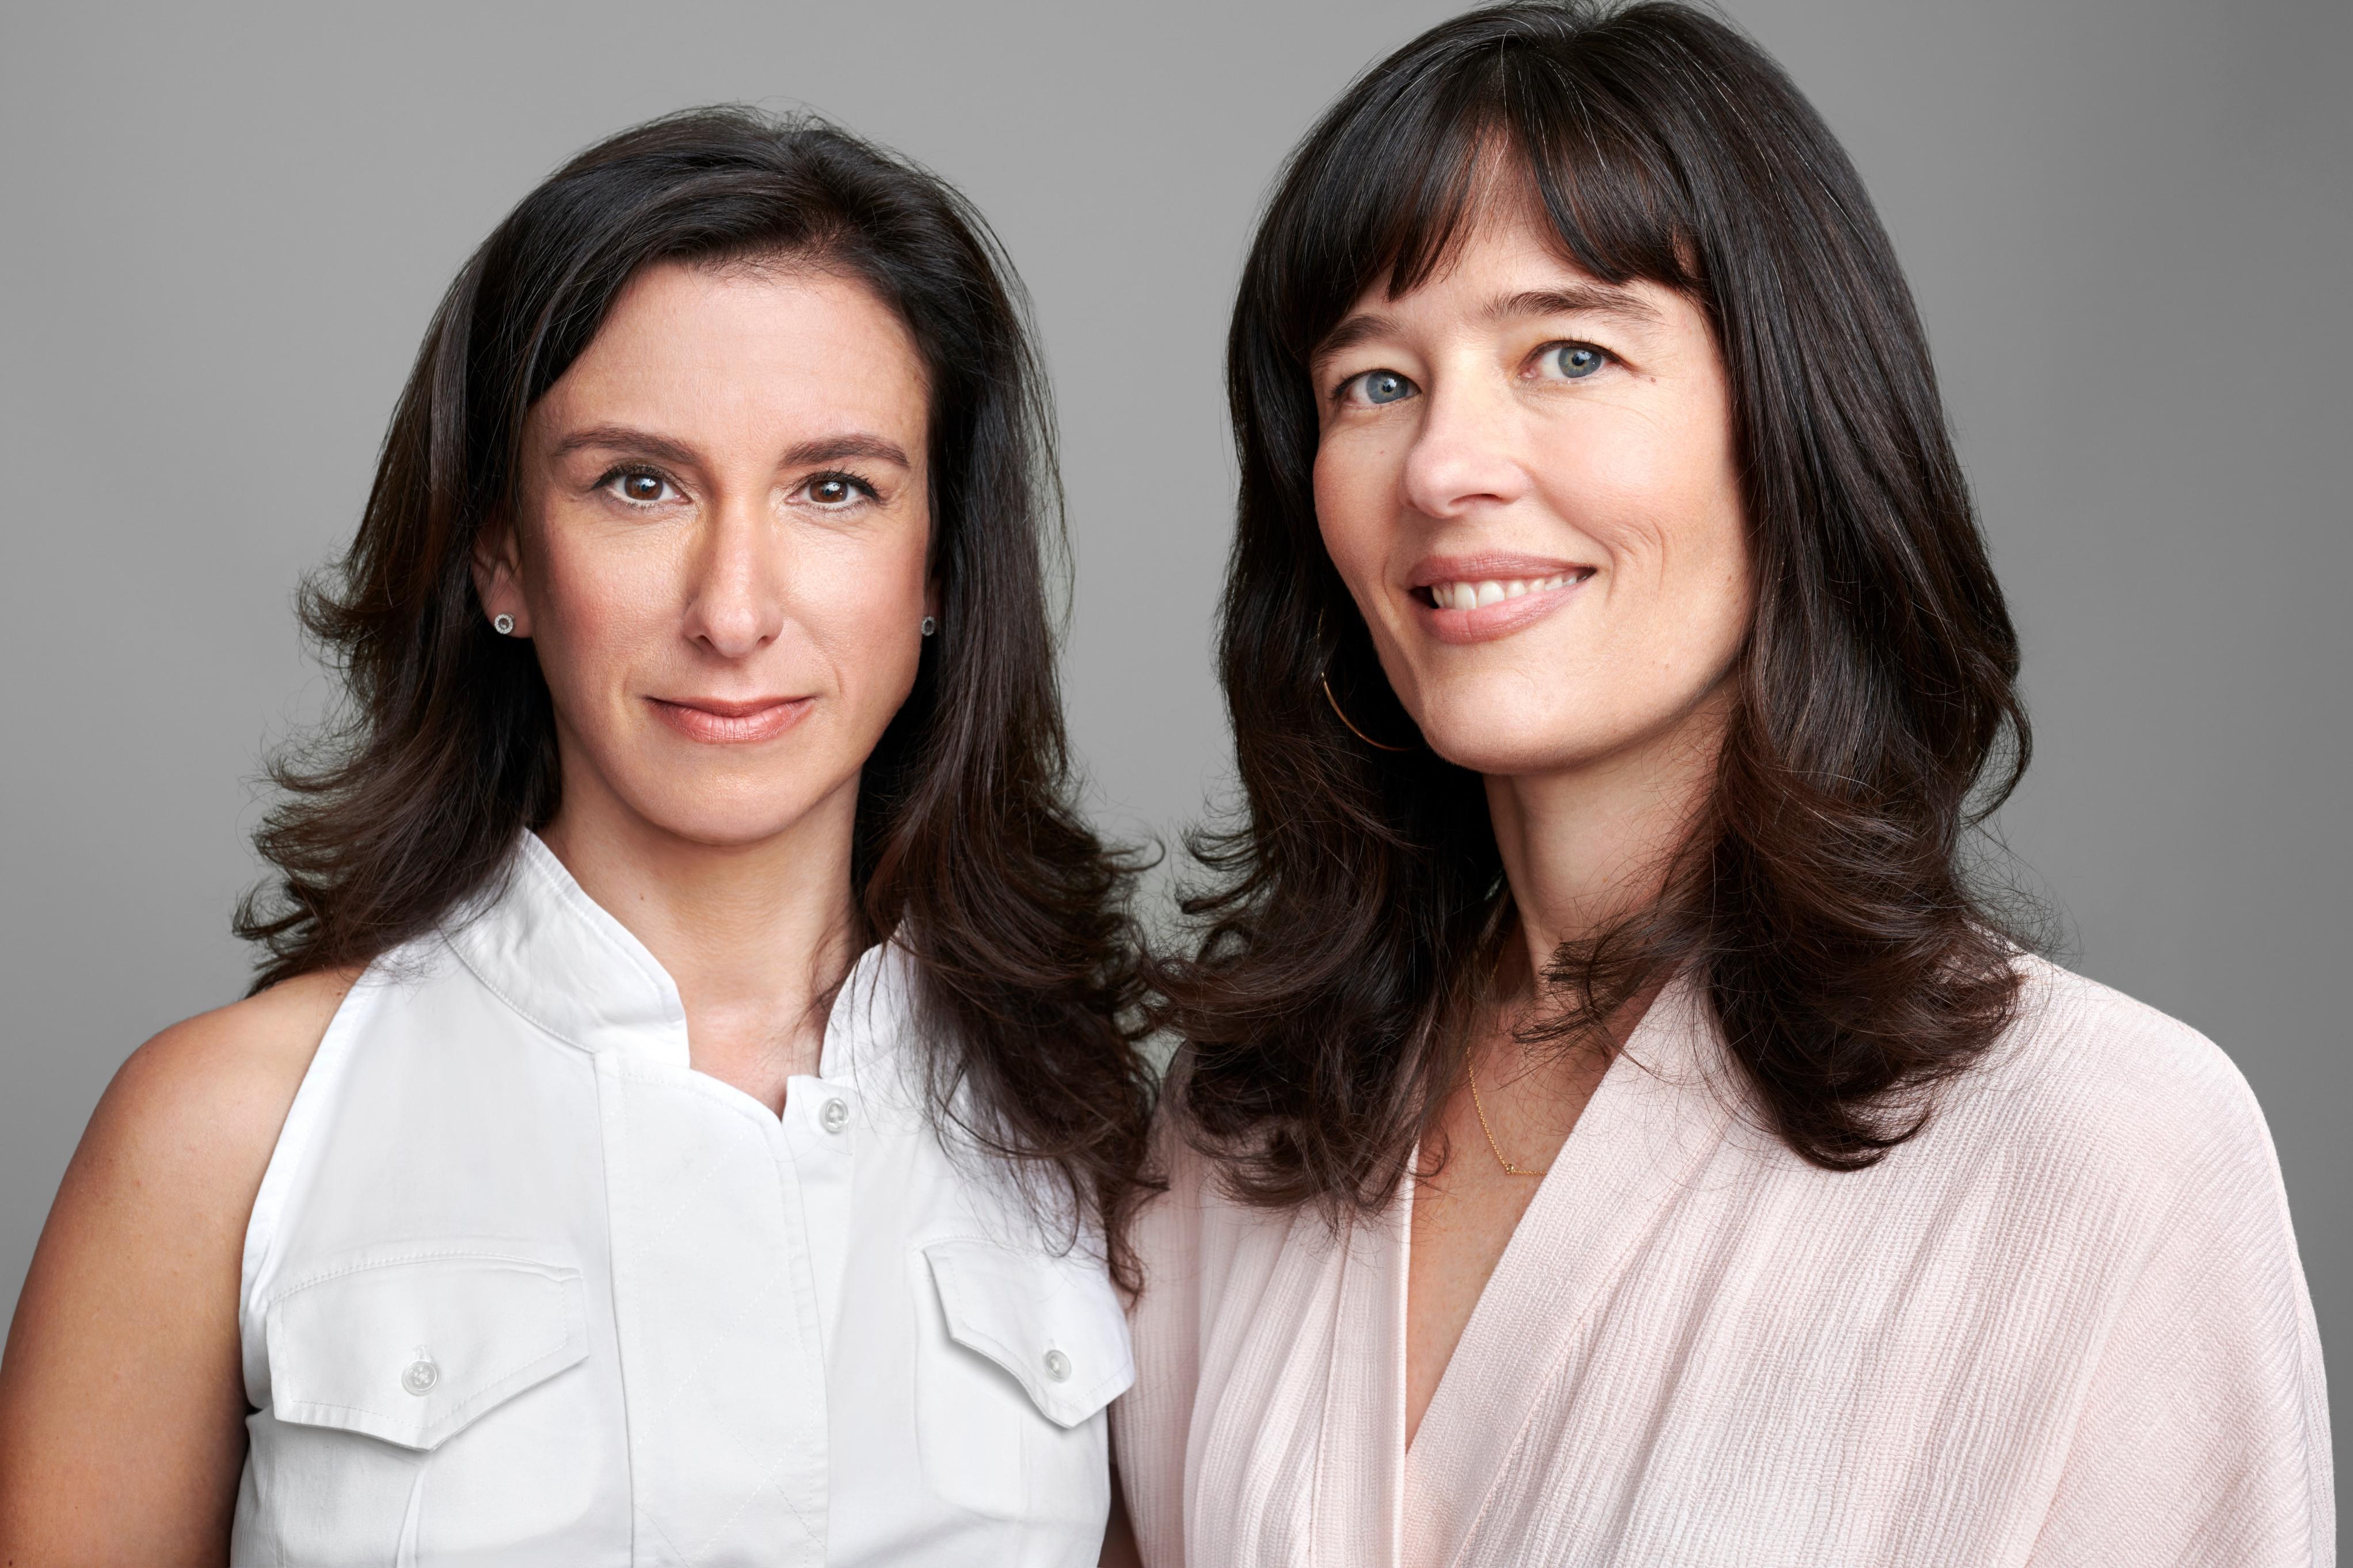 Jodi Kantor & Megan Twohey